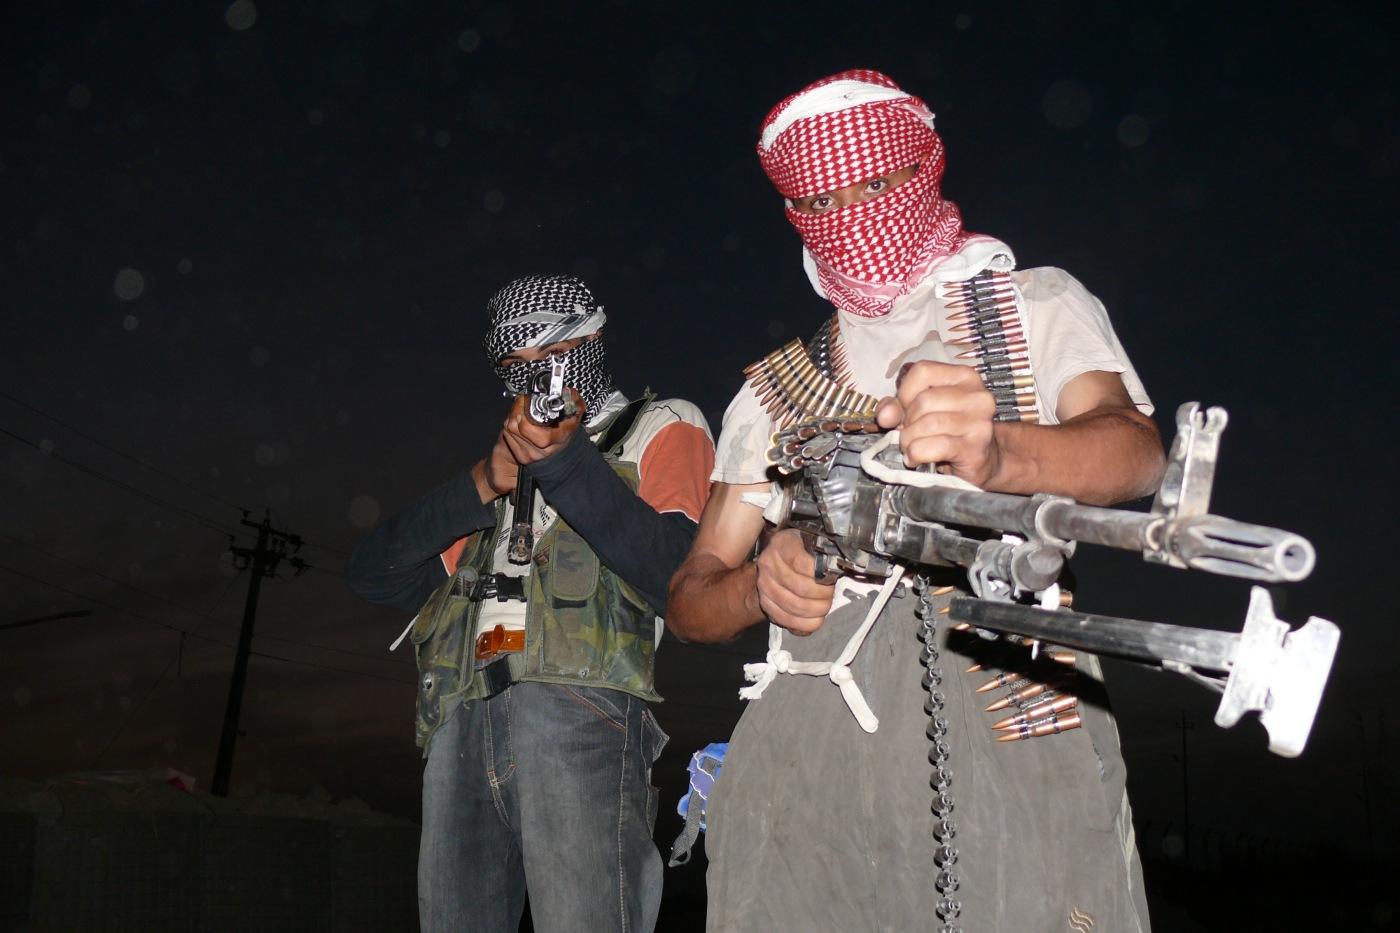 iraqi_insurgents_with_guns_2006